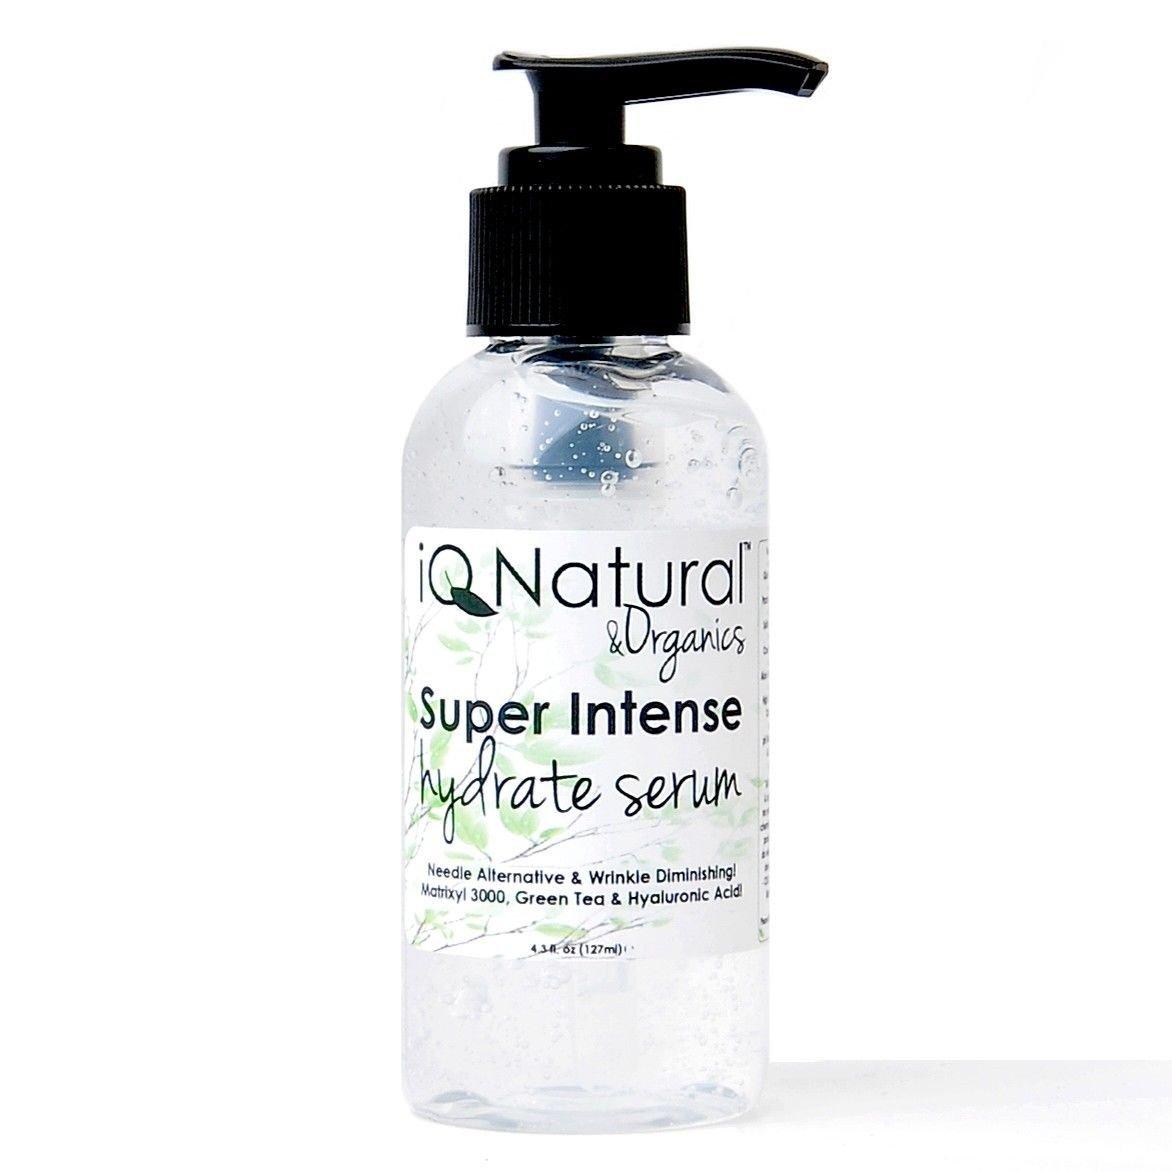 Peptide Anti Aging Face Skin Firming Serum ha HYALURONIC ACID 60% Matrixyl 3000